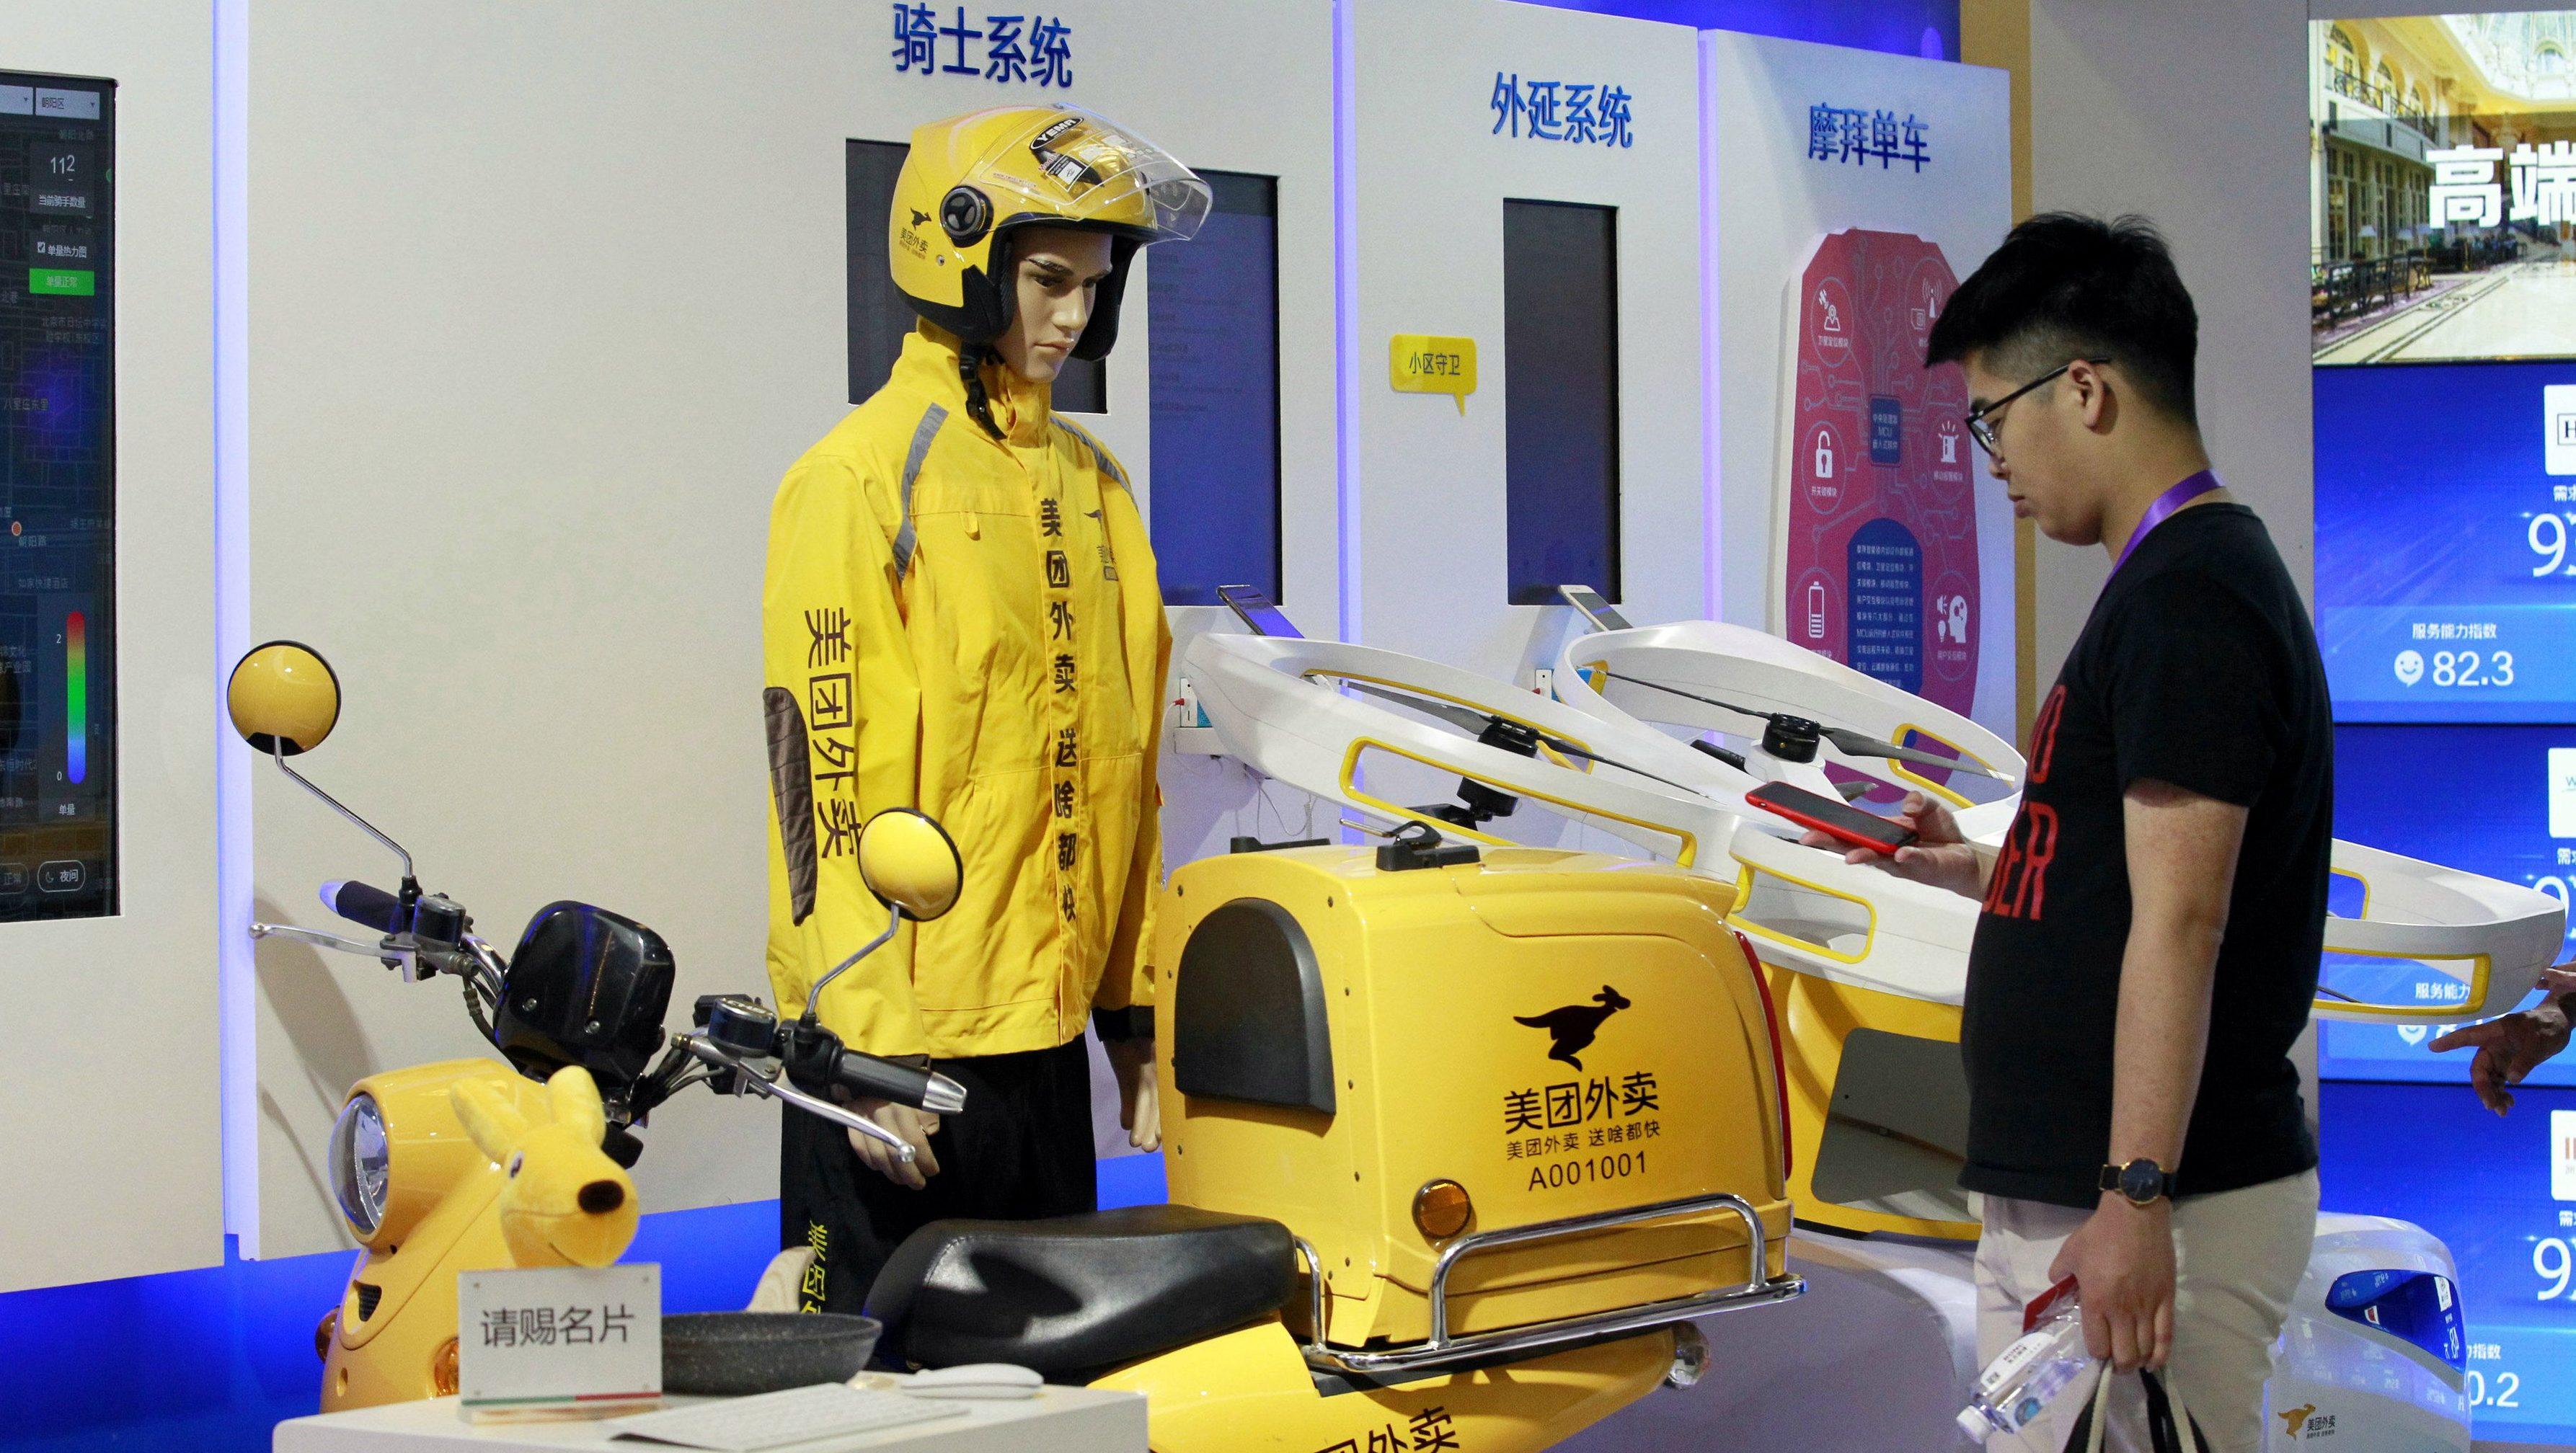 996 ICU: GitHub hosts Chinese tech worker complaints — Quartz